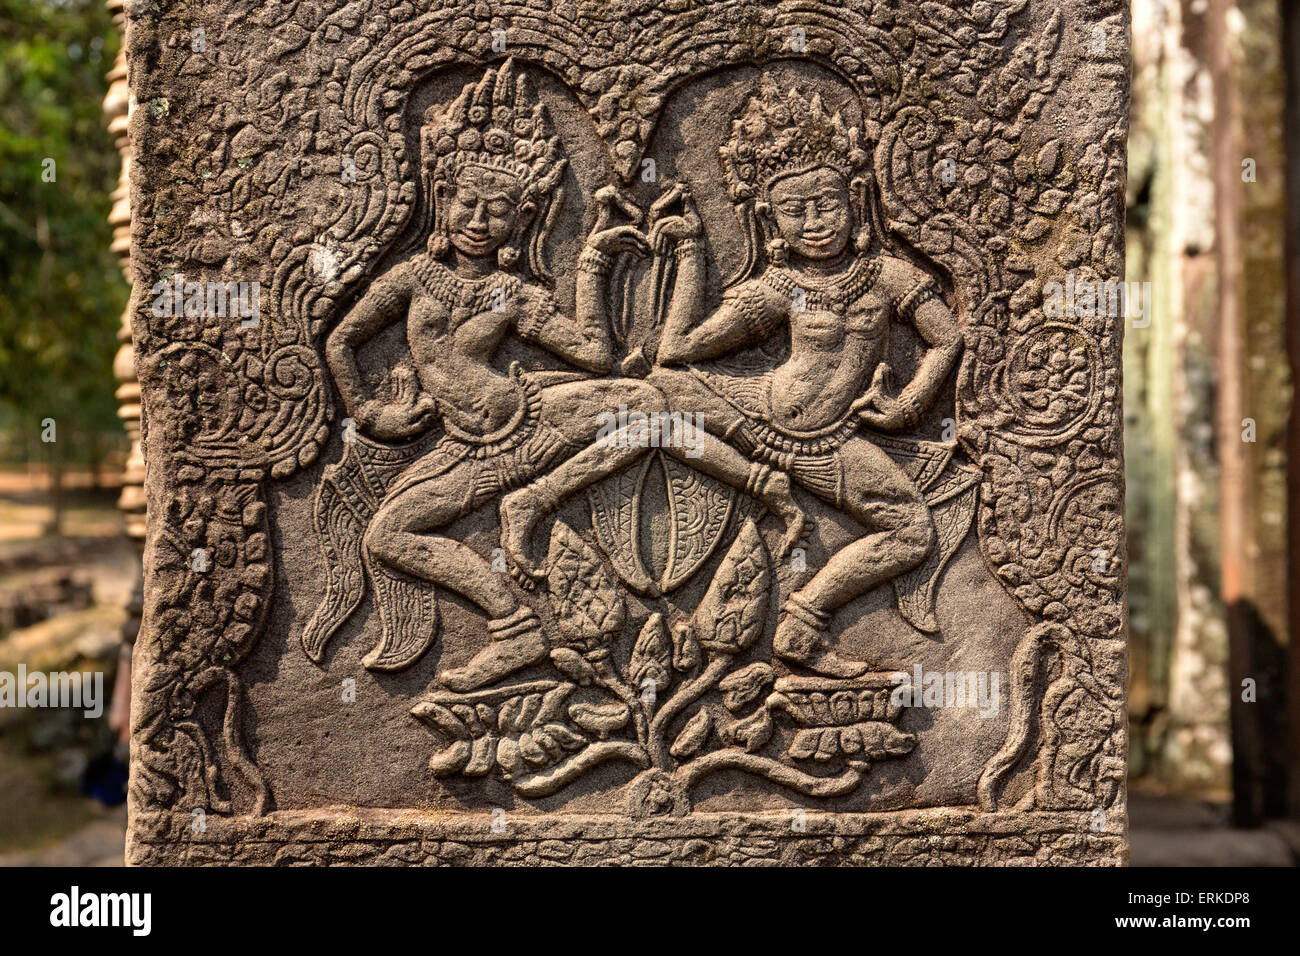 Dancing Apsaras, bas-relief, Bayon Temple, Angkor Thom, Siem Reap, Cambodia - Stock Image